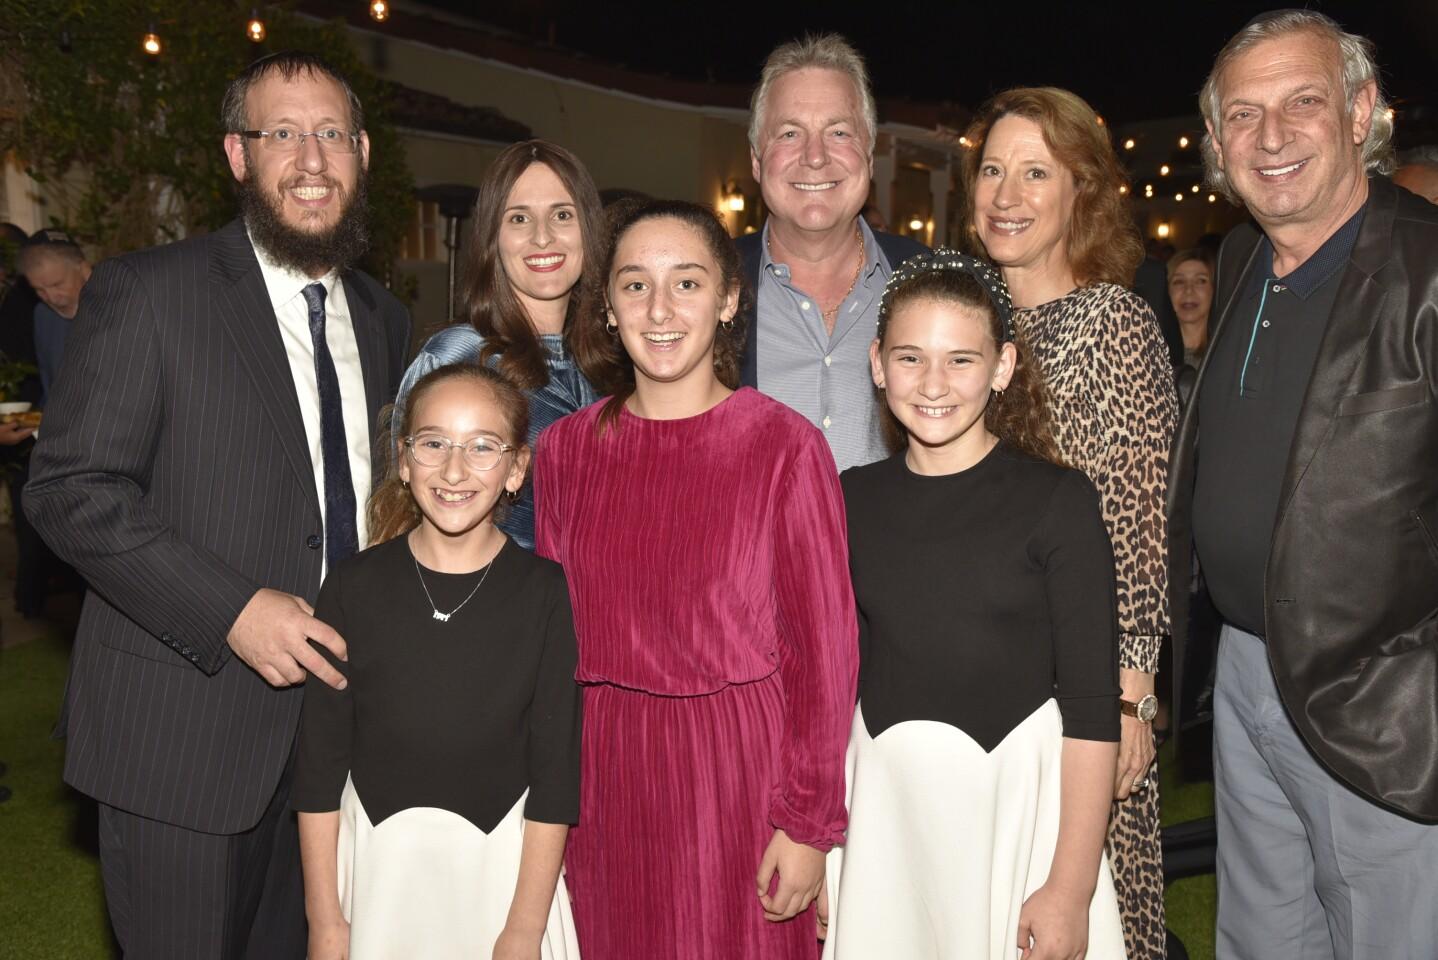 Rabbi Levi and Devorah Raskin with Chaya, Dena, and Mussi, Mark and Elizabeth Greenhill, Michael Greenhill